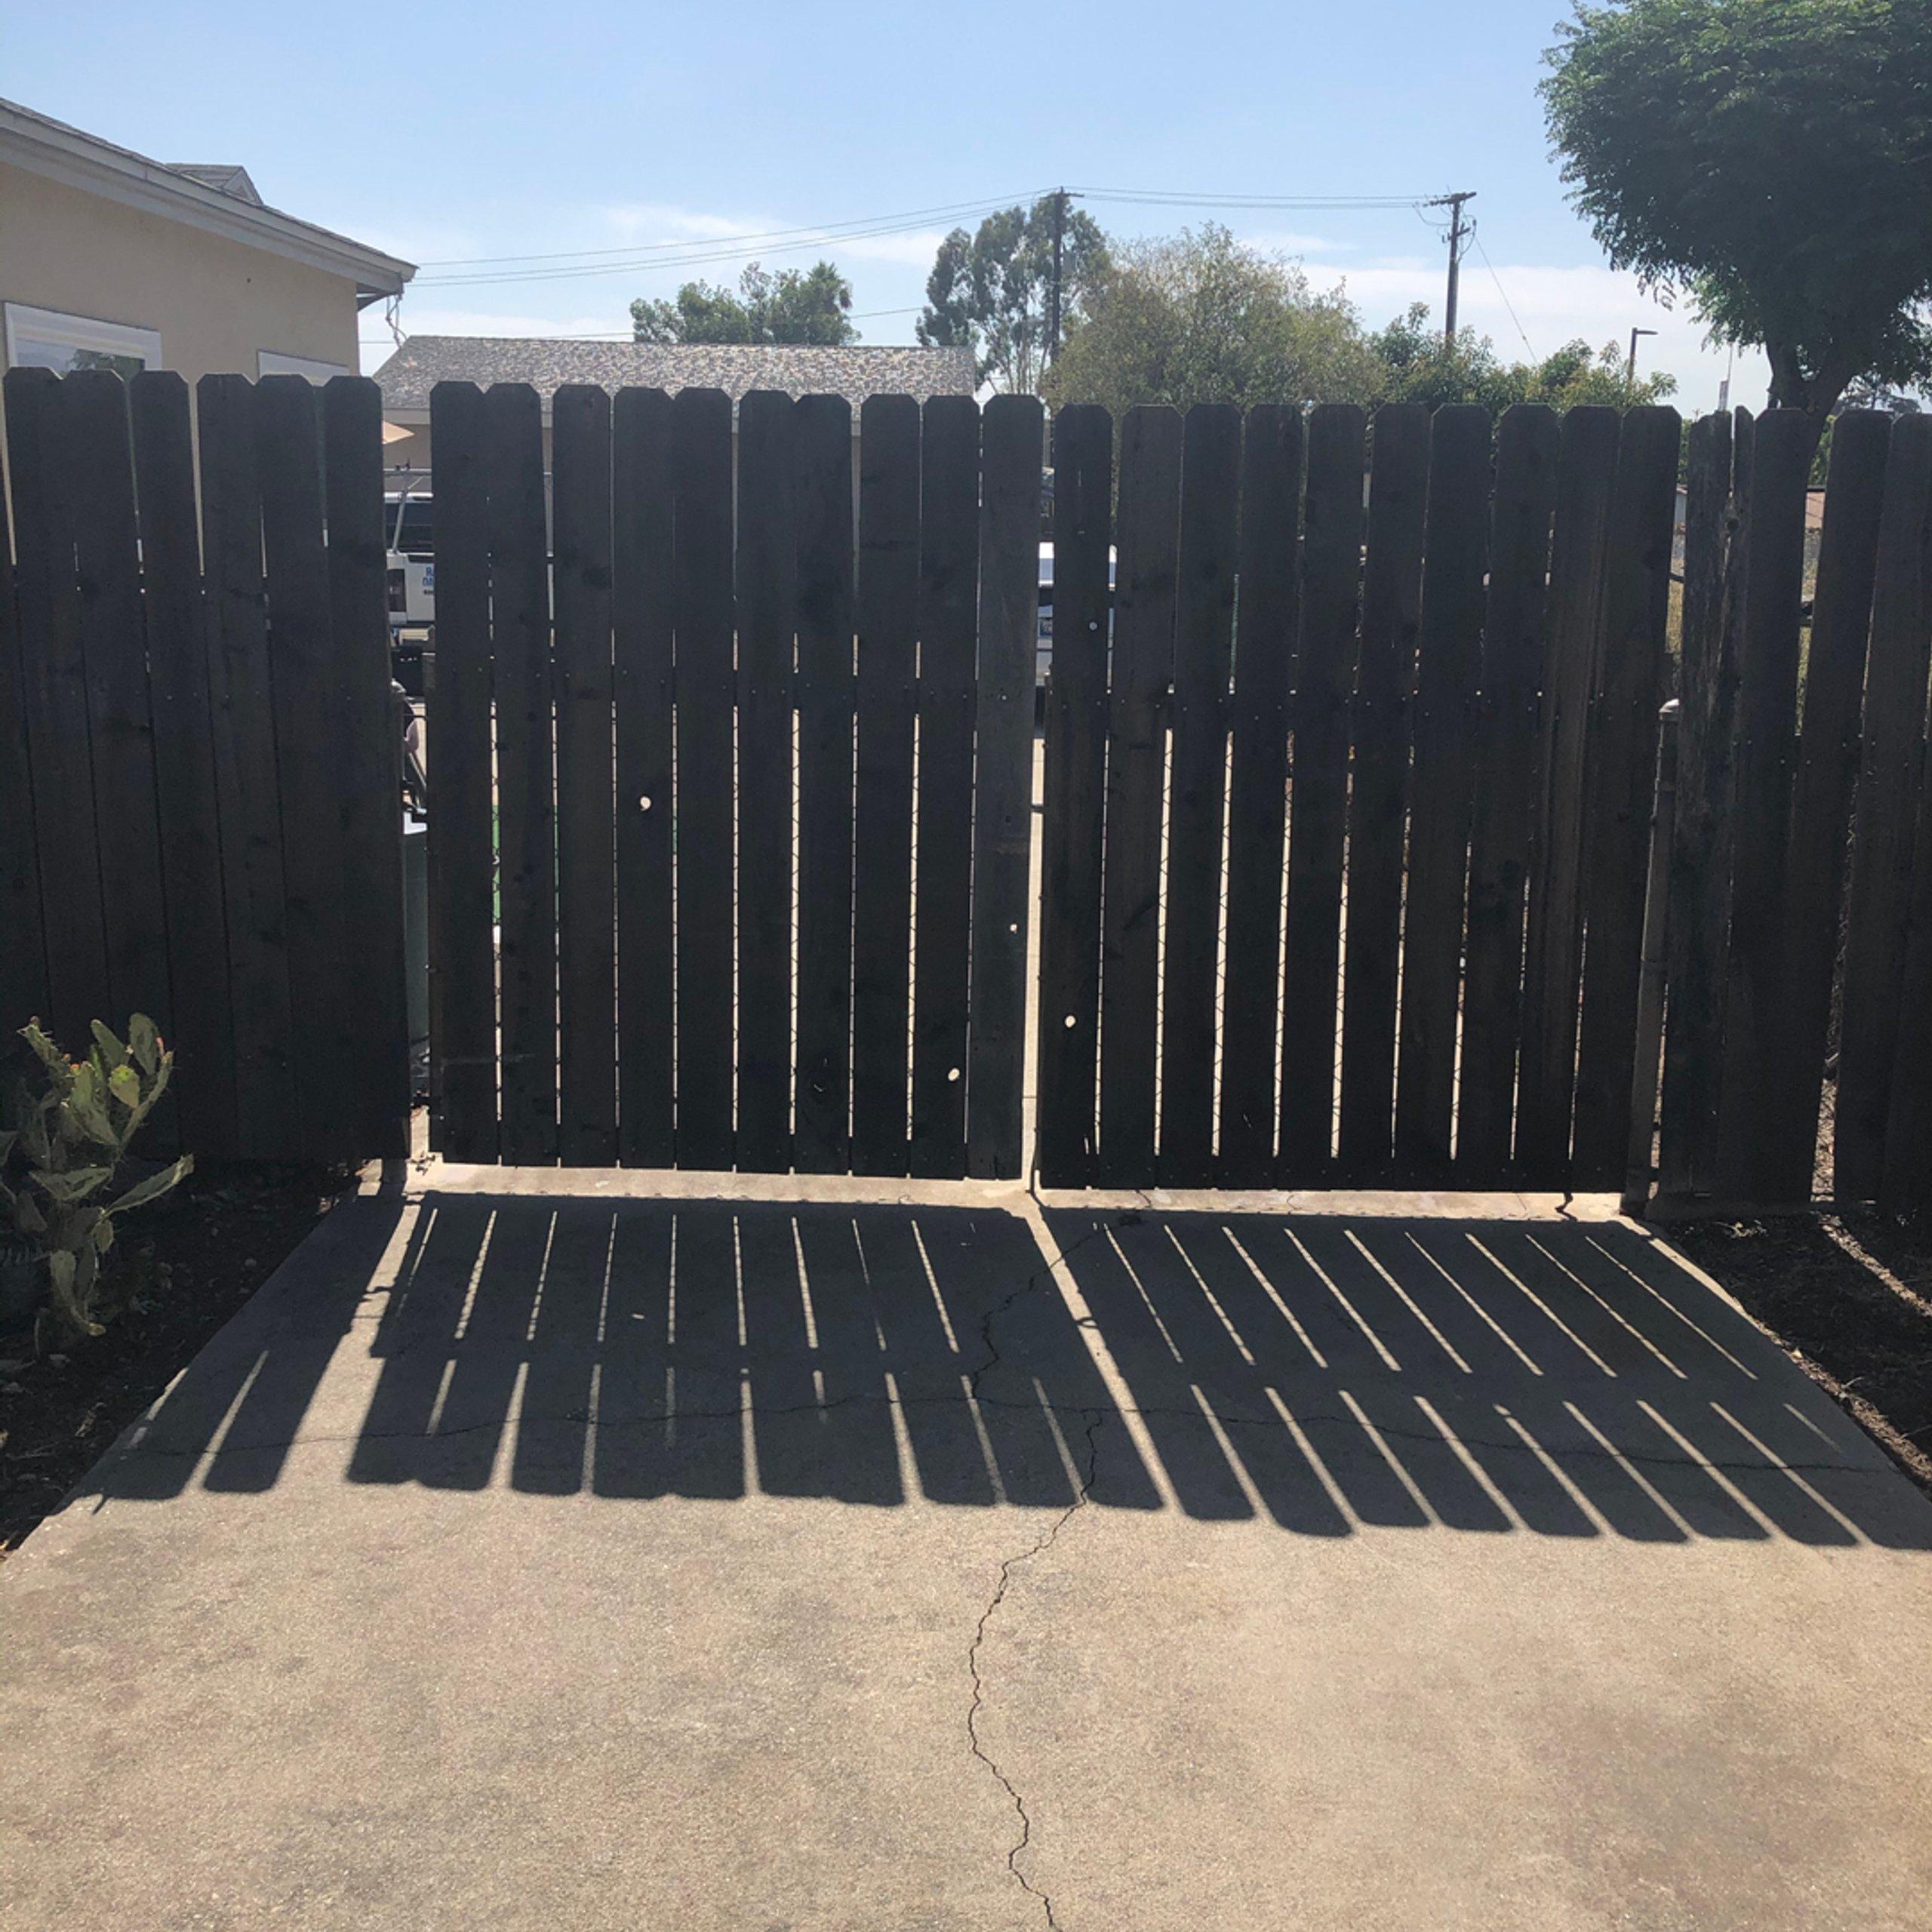 30x15 Unpaved Lot self storage unit